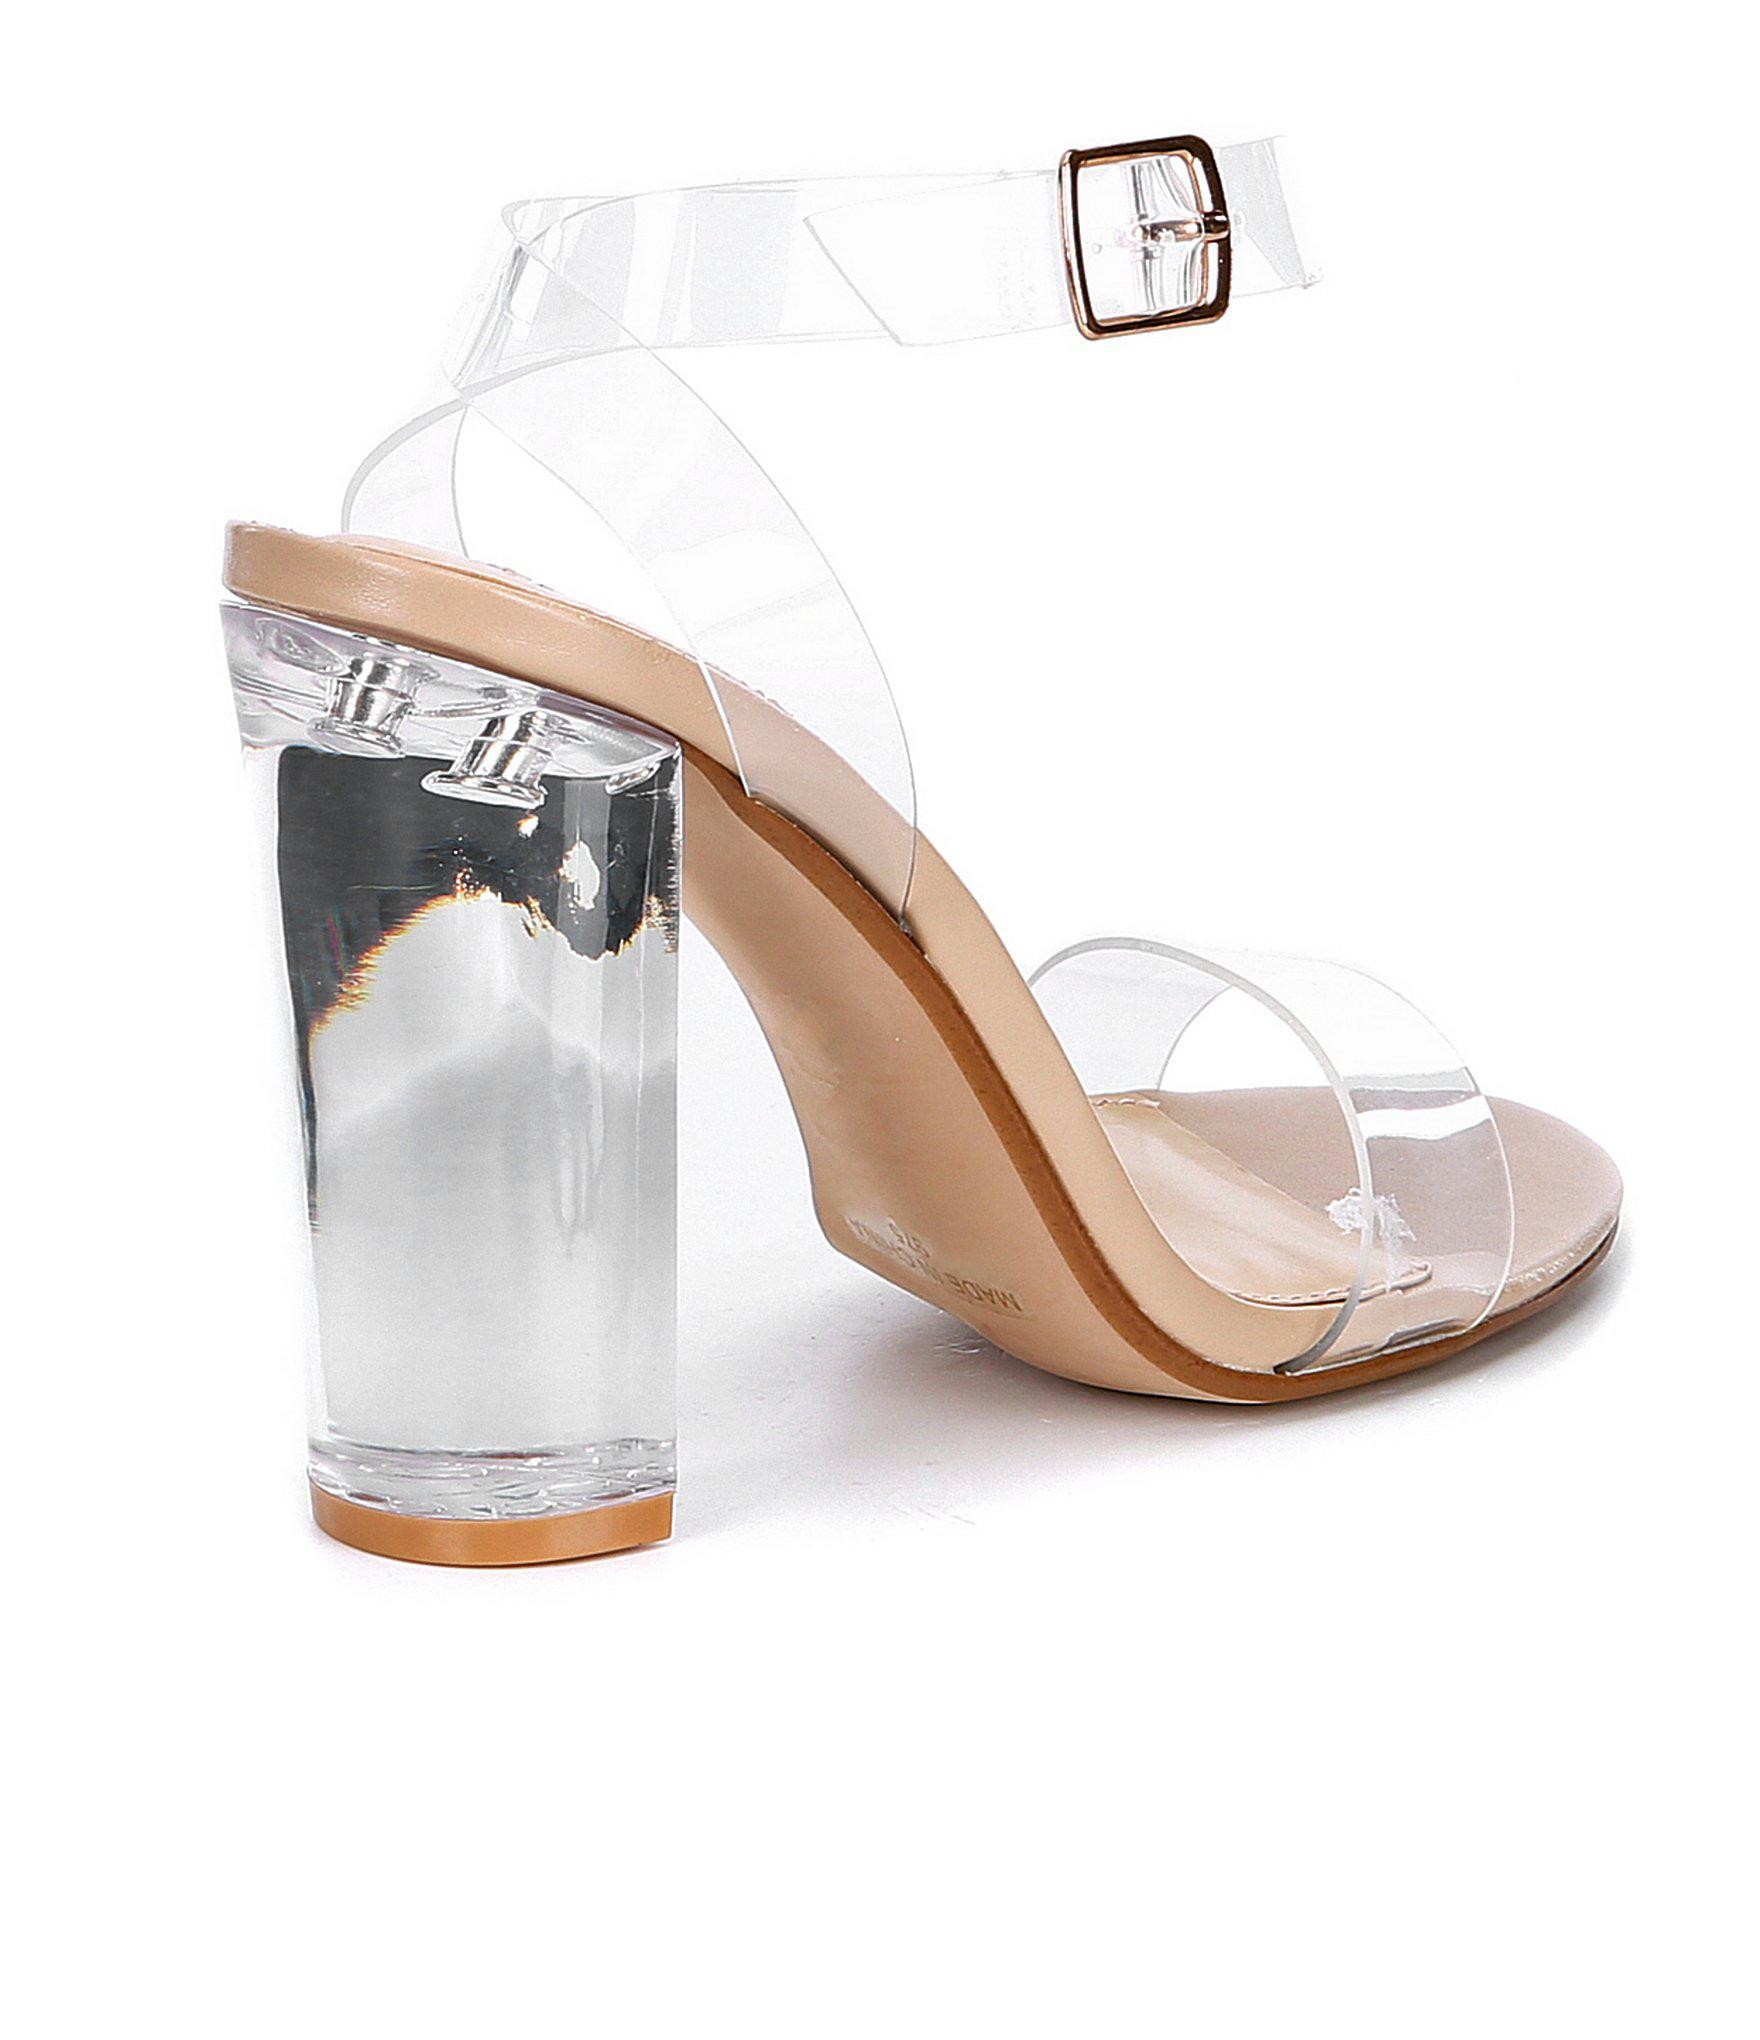 1aaea495f2c7c Steve Madden - Multicolor Camille Lucite Clear Block Heel Dress Sandals -  Lyst. View fullscreen